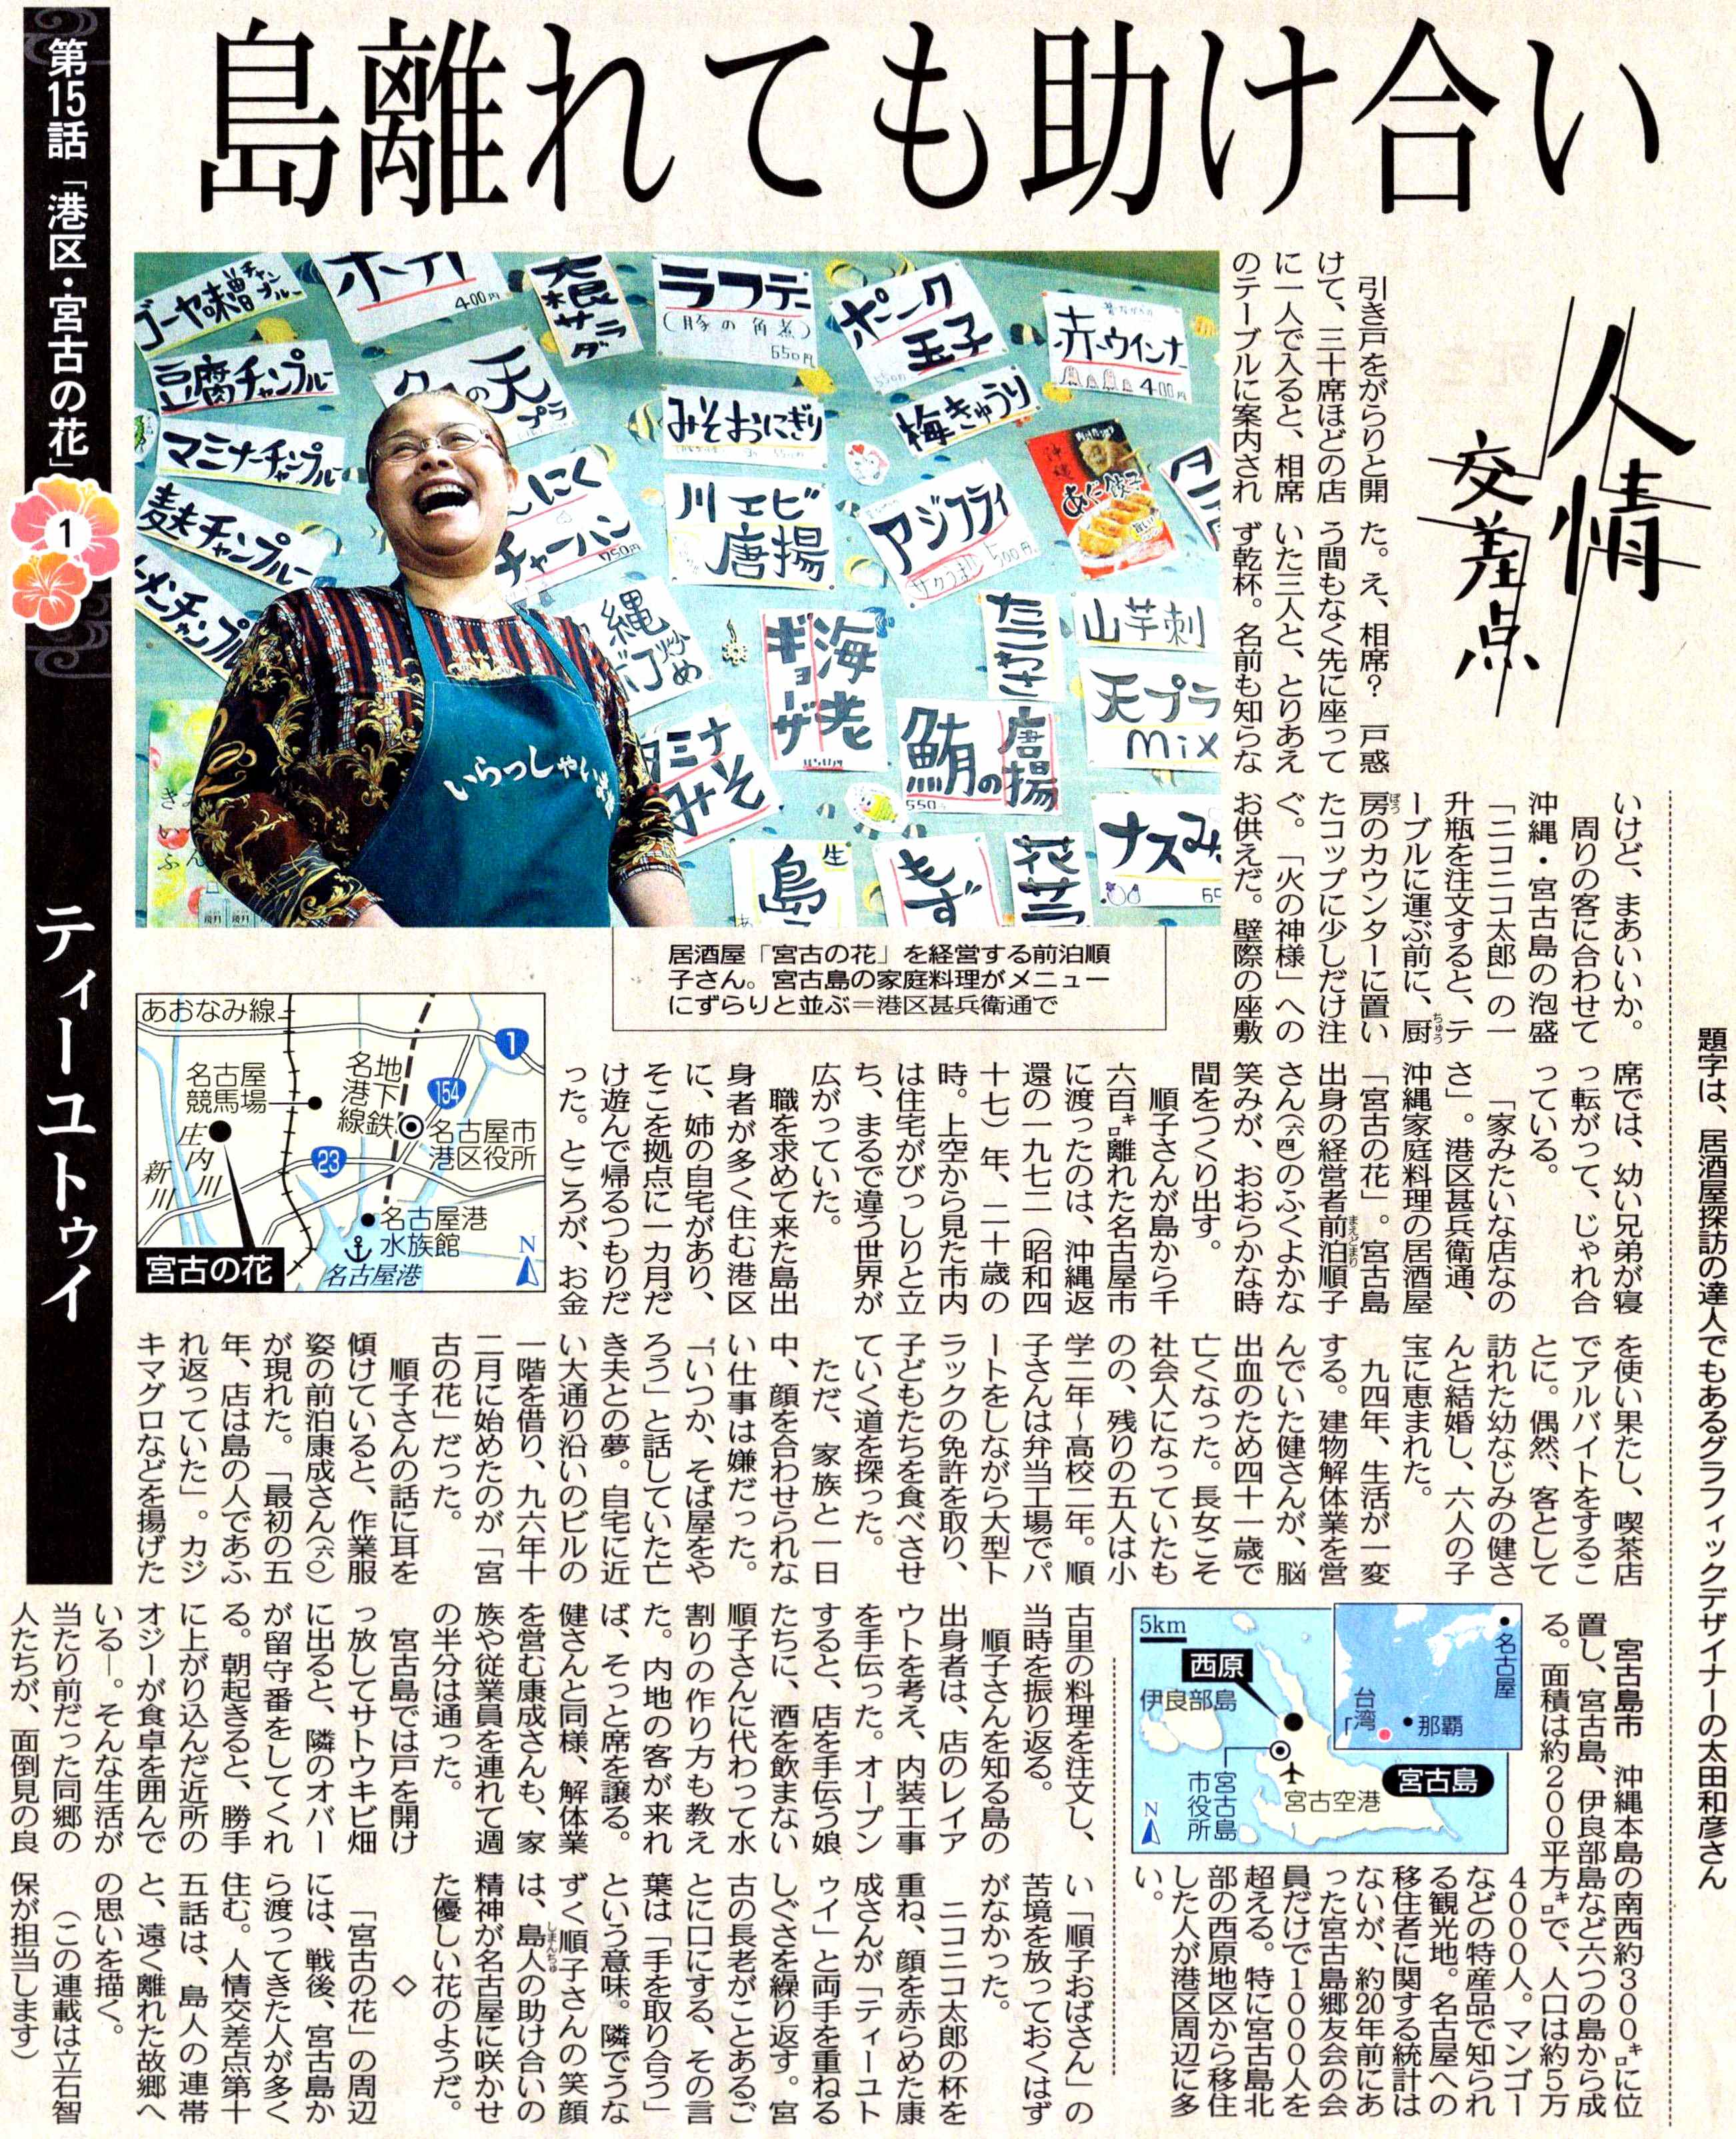 https://img.atwikiimg.com/www45.atwiki.jp/jippensha/attach/72/5331/10_01.jpg